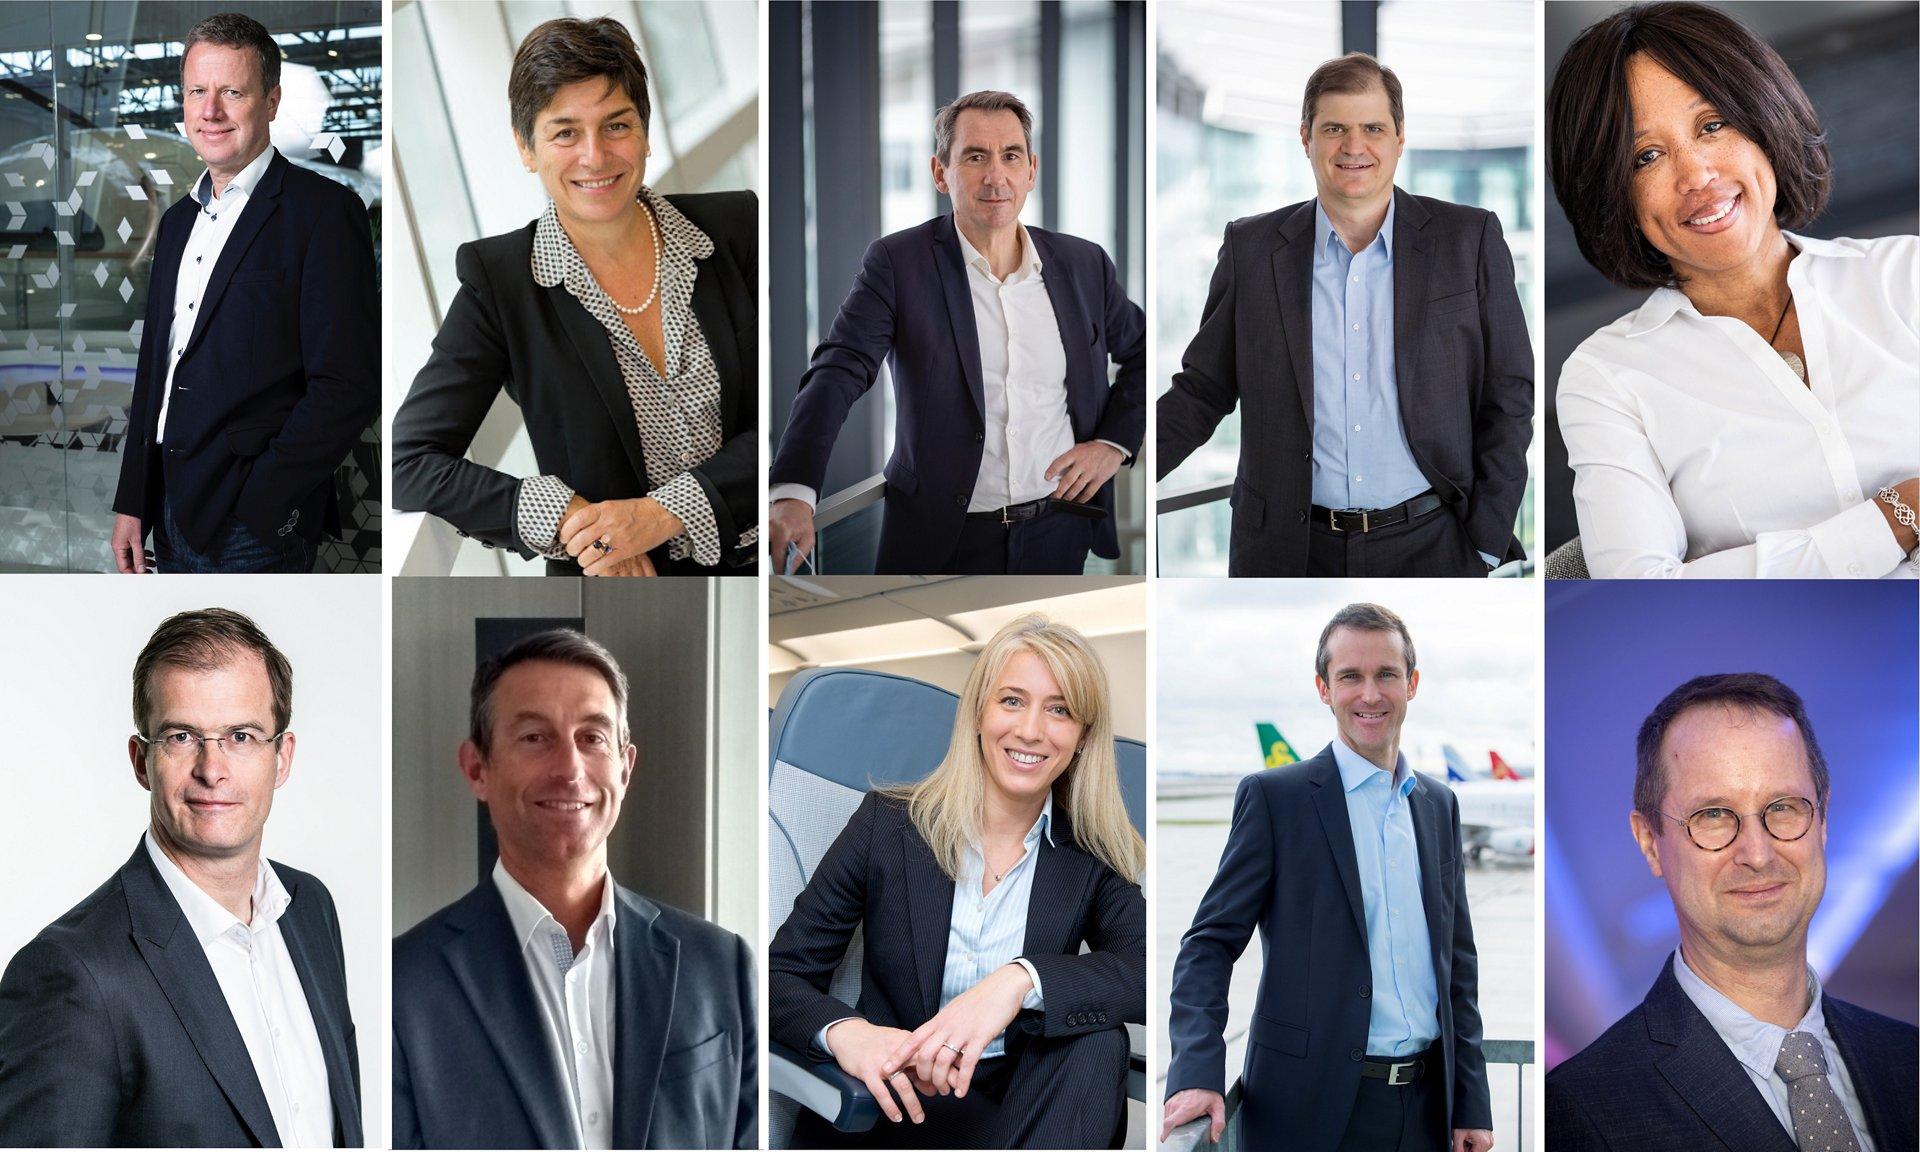 Airbus Customer Services Executive Team